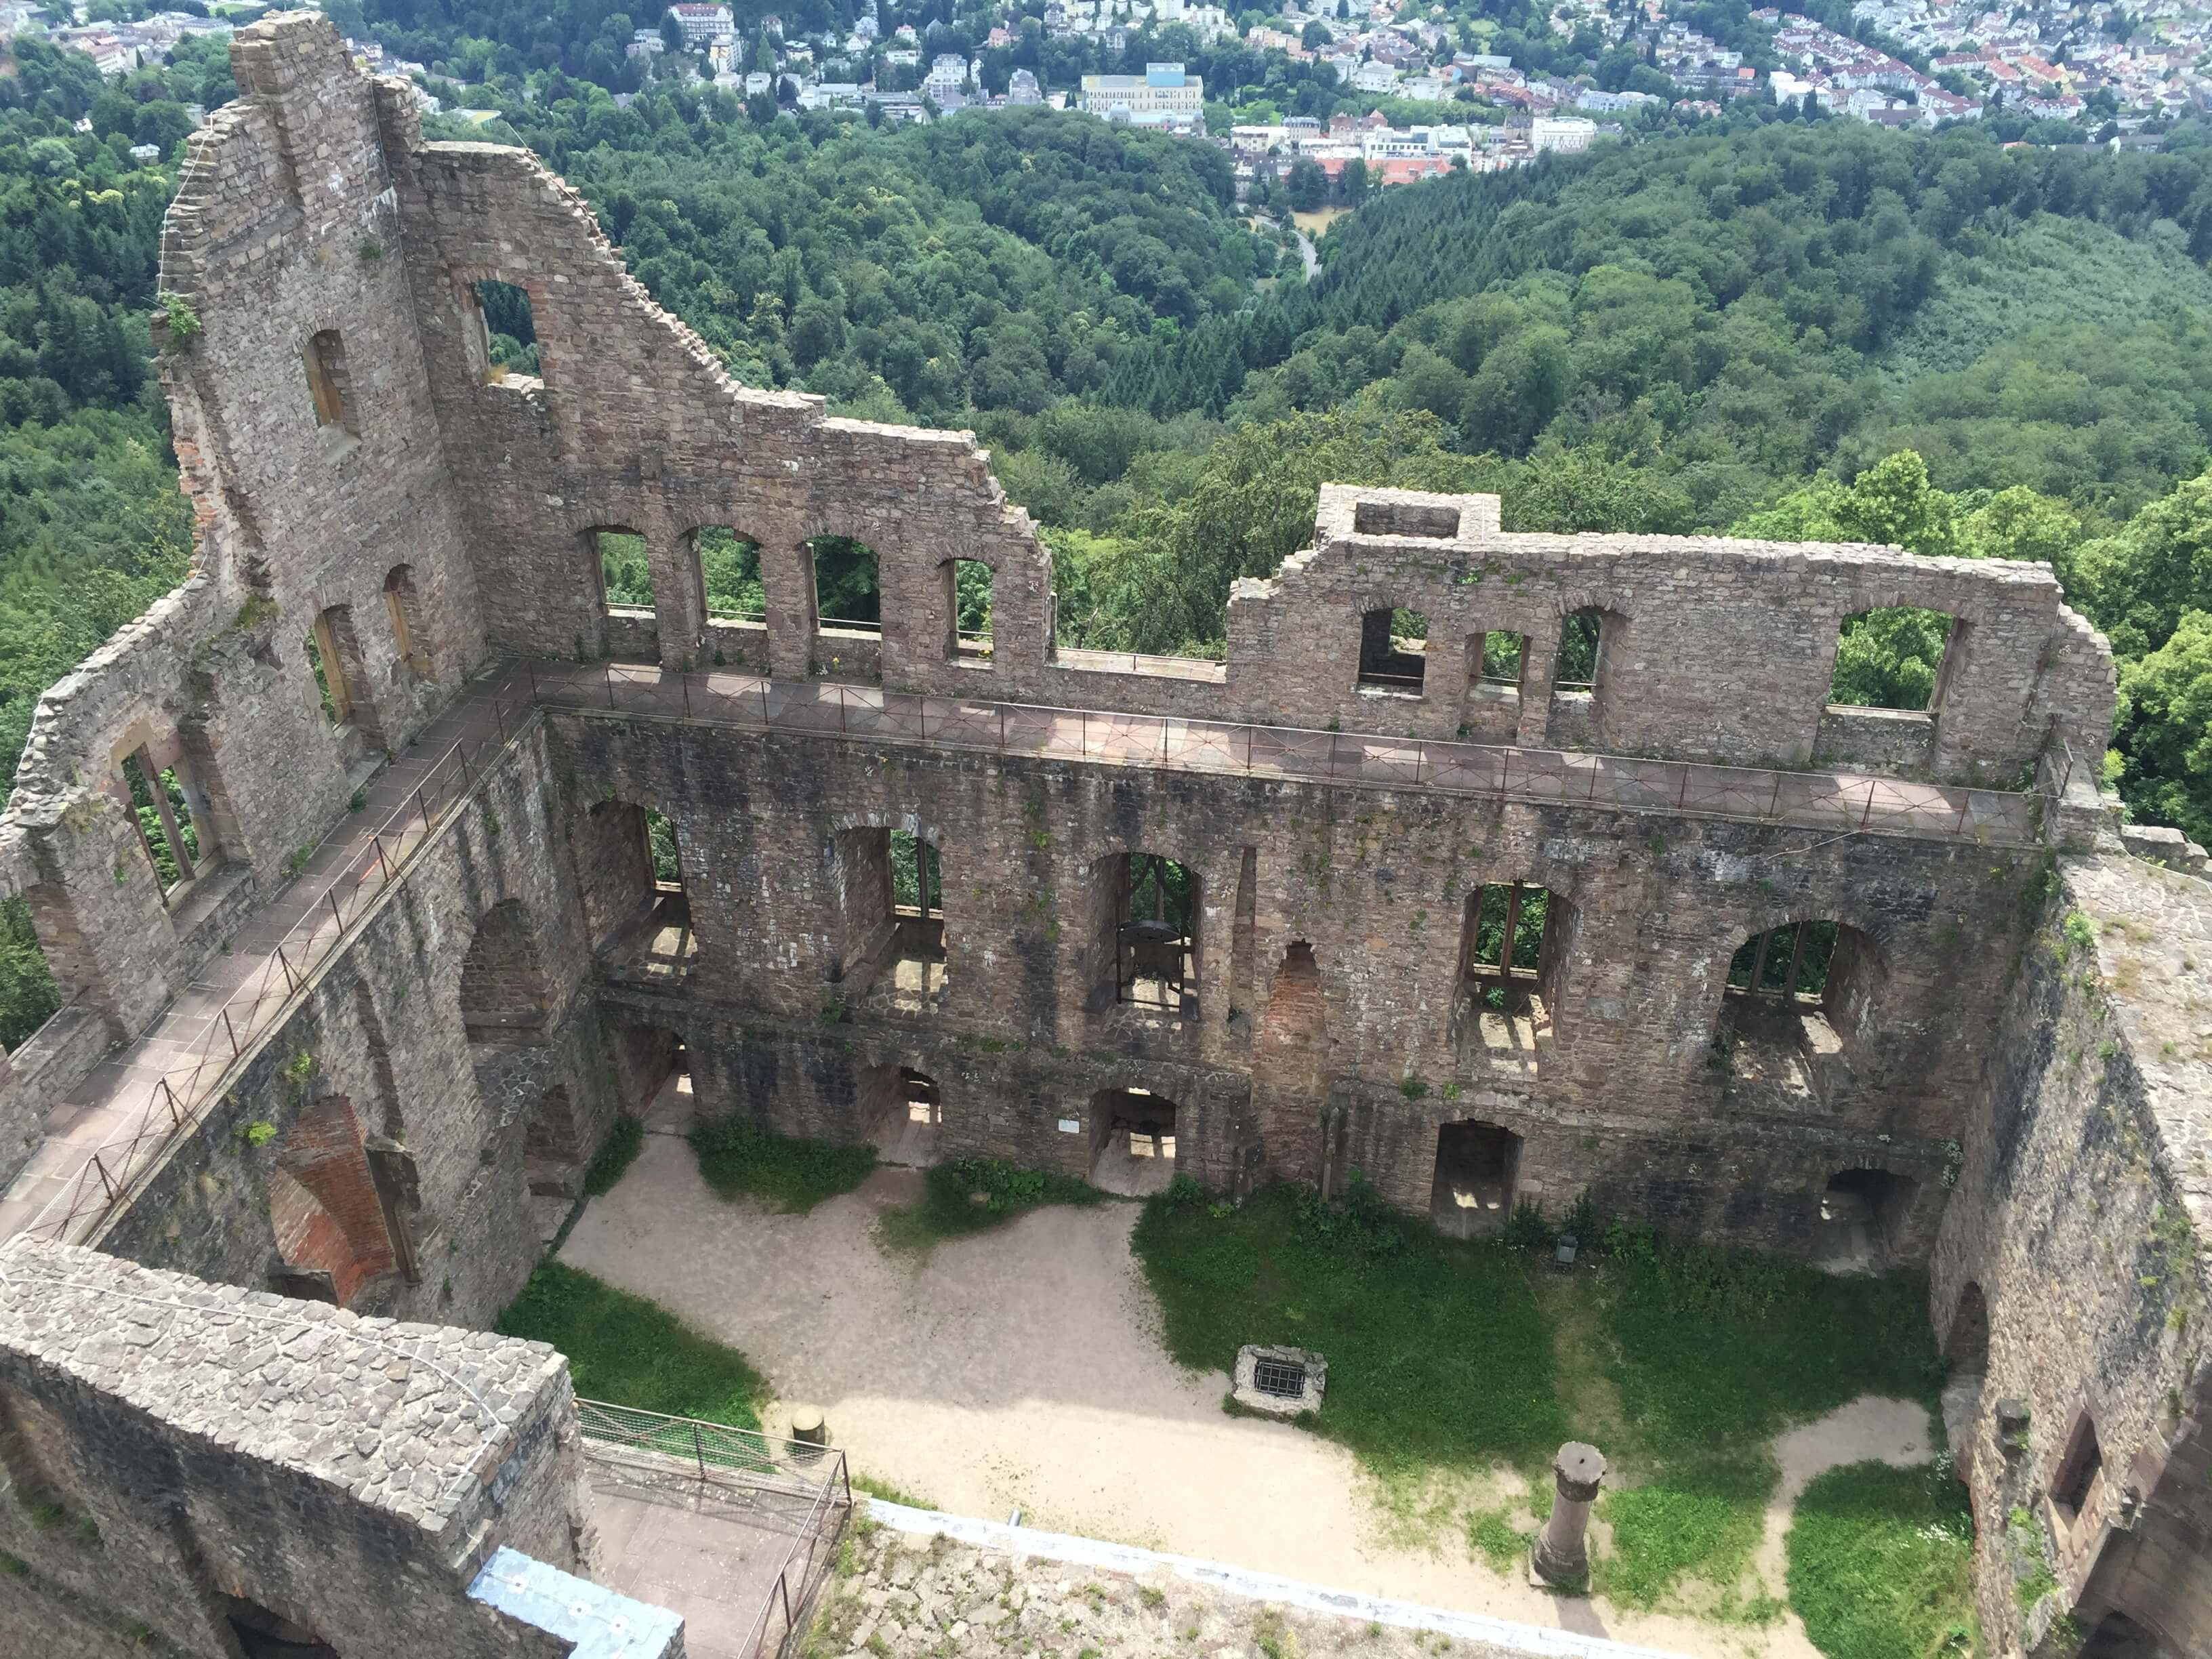 Baden Baden Castle in Germany one of the best castles in europe